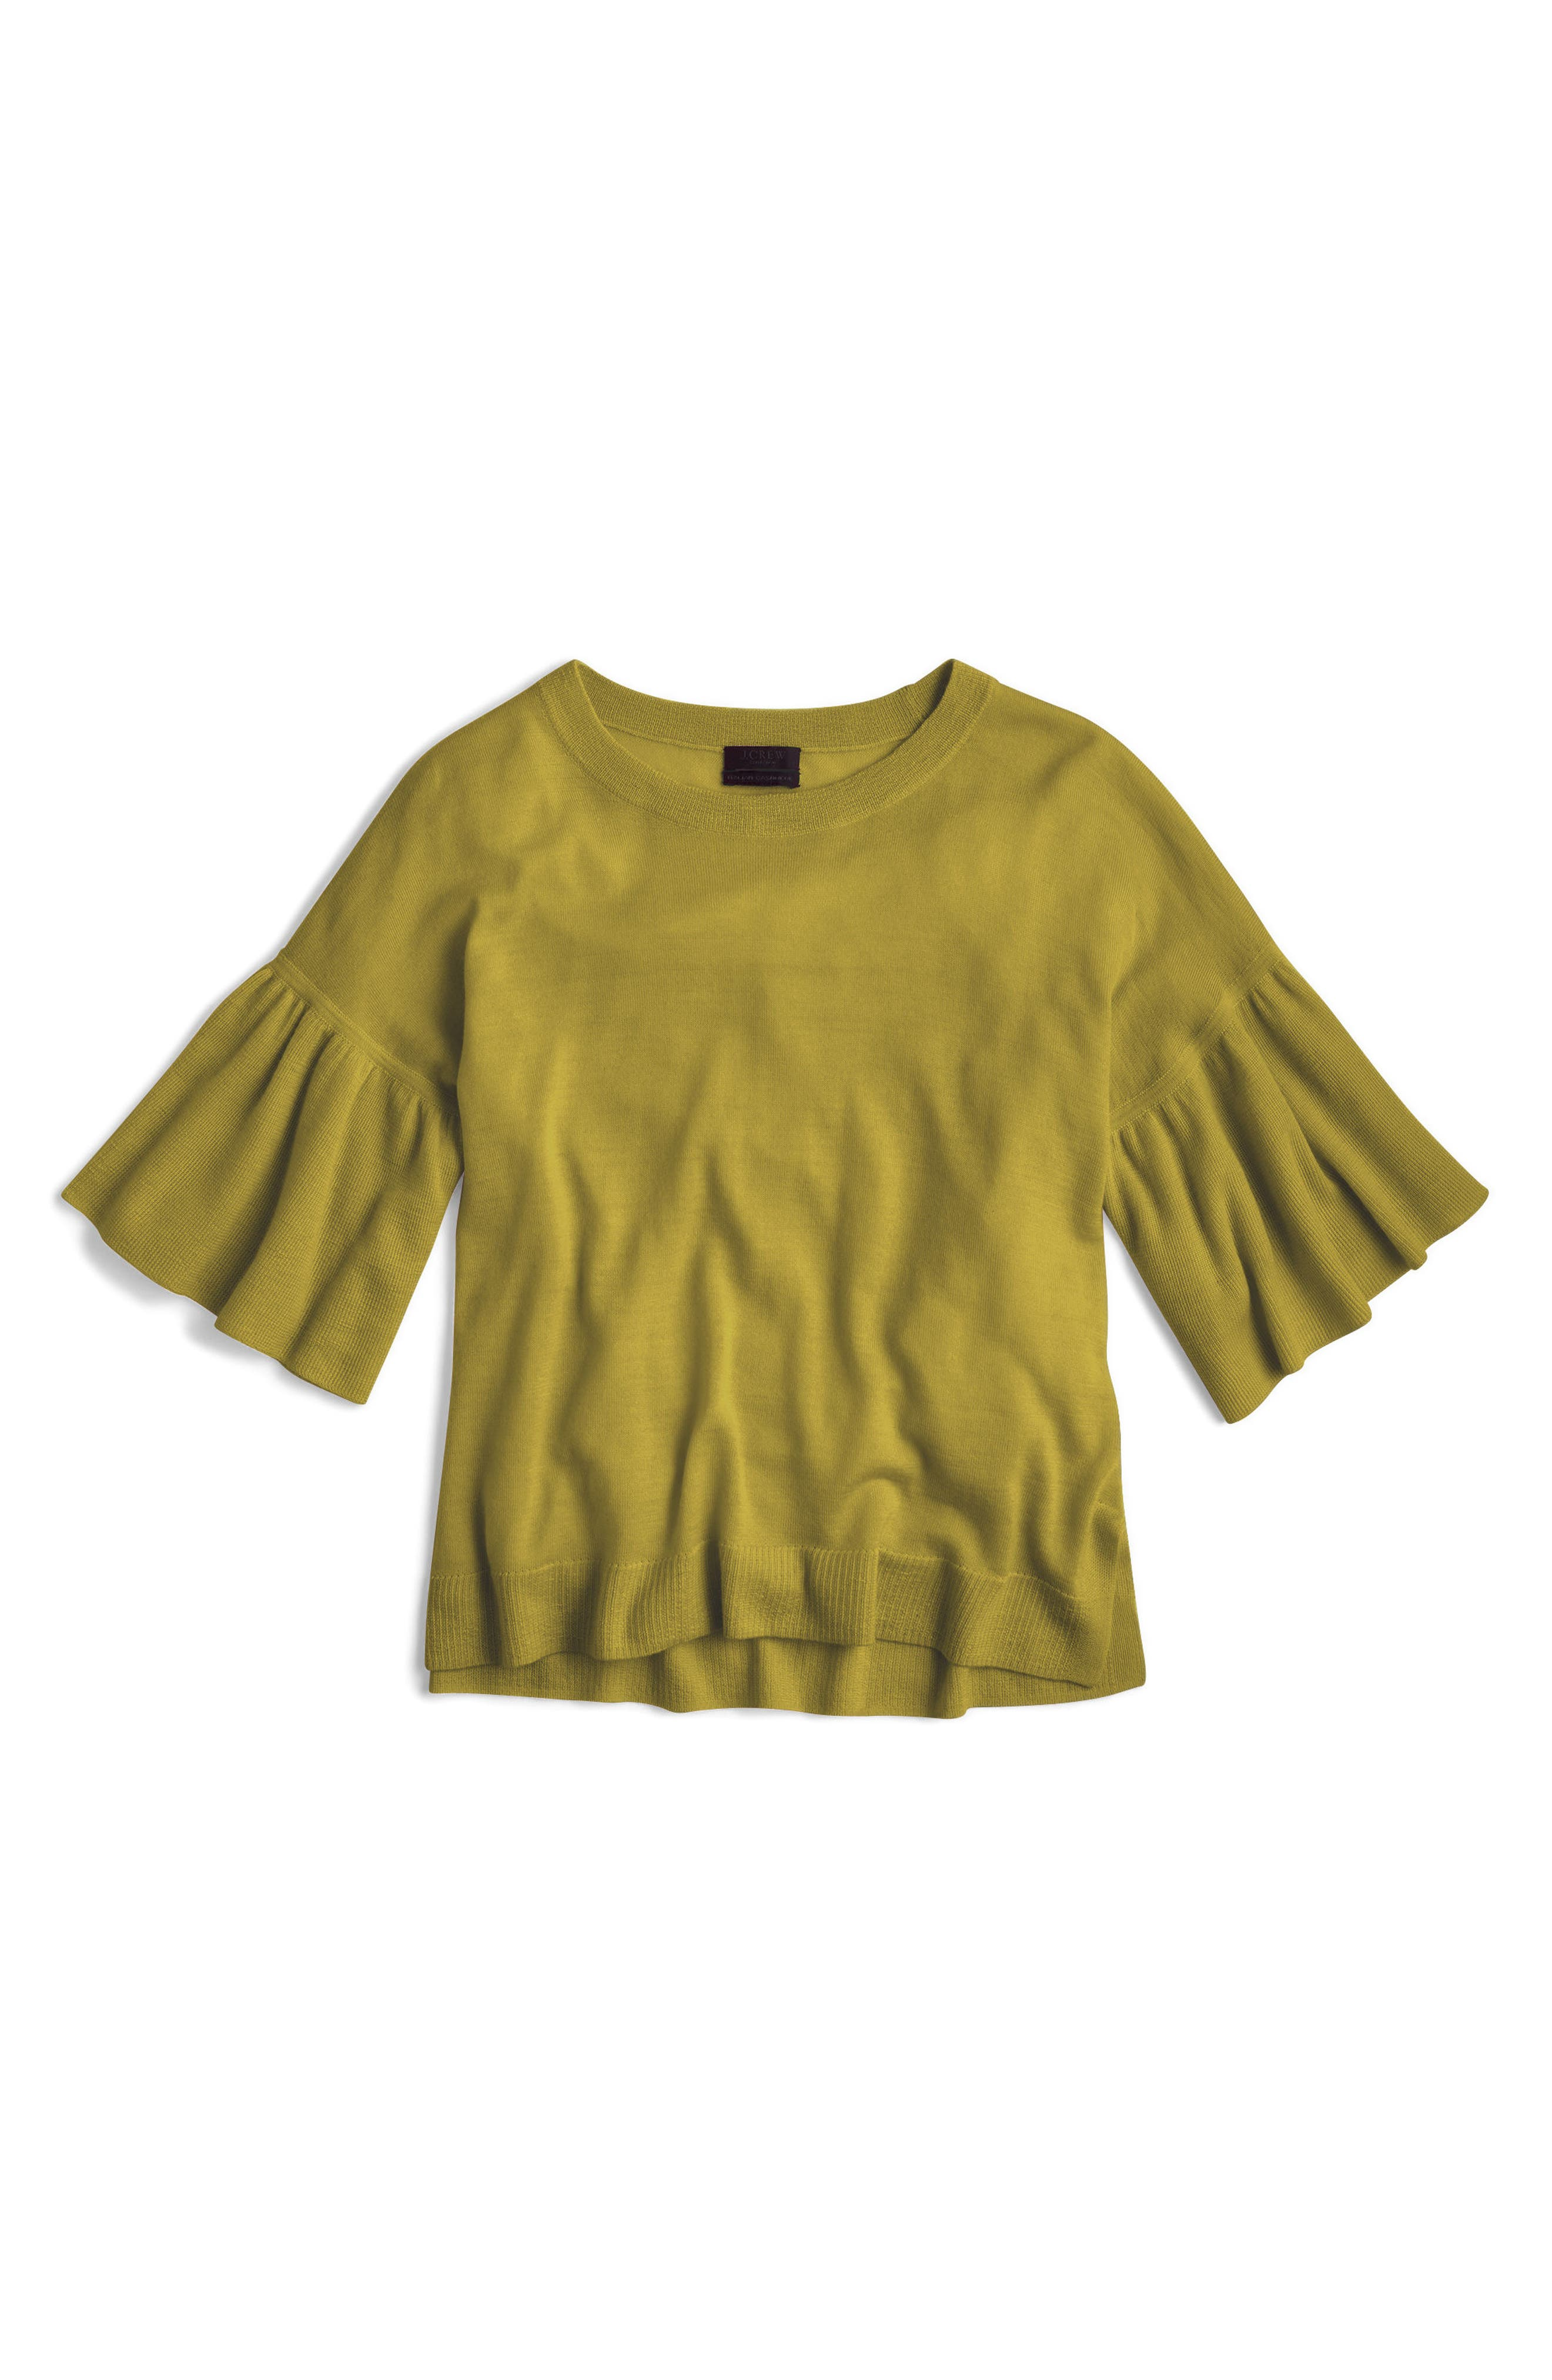 Main Image - J.Crew Featherweight Cashmere Ruffle Sleeve Sweater